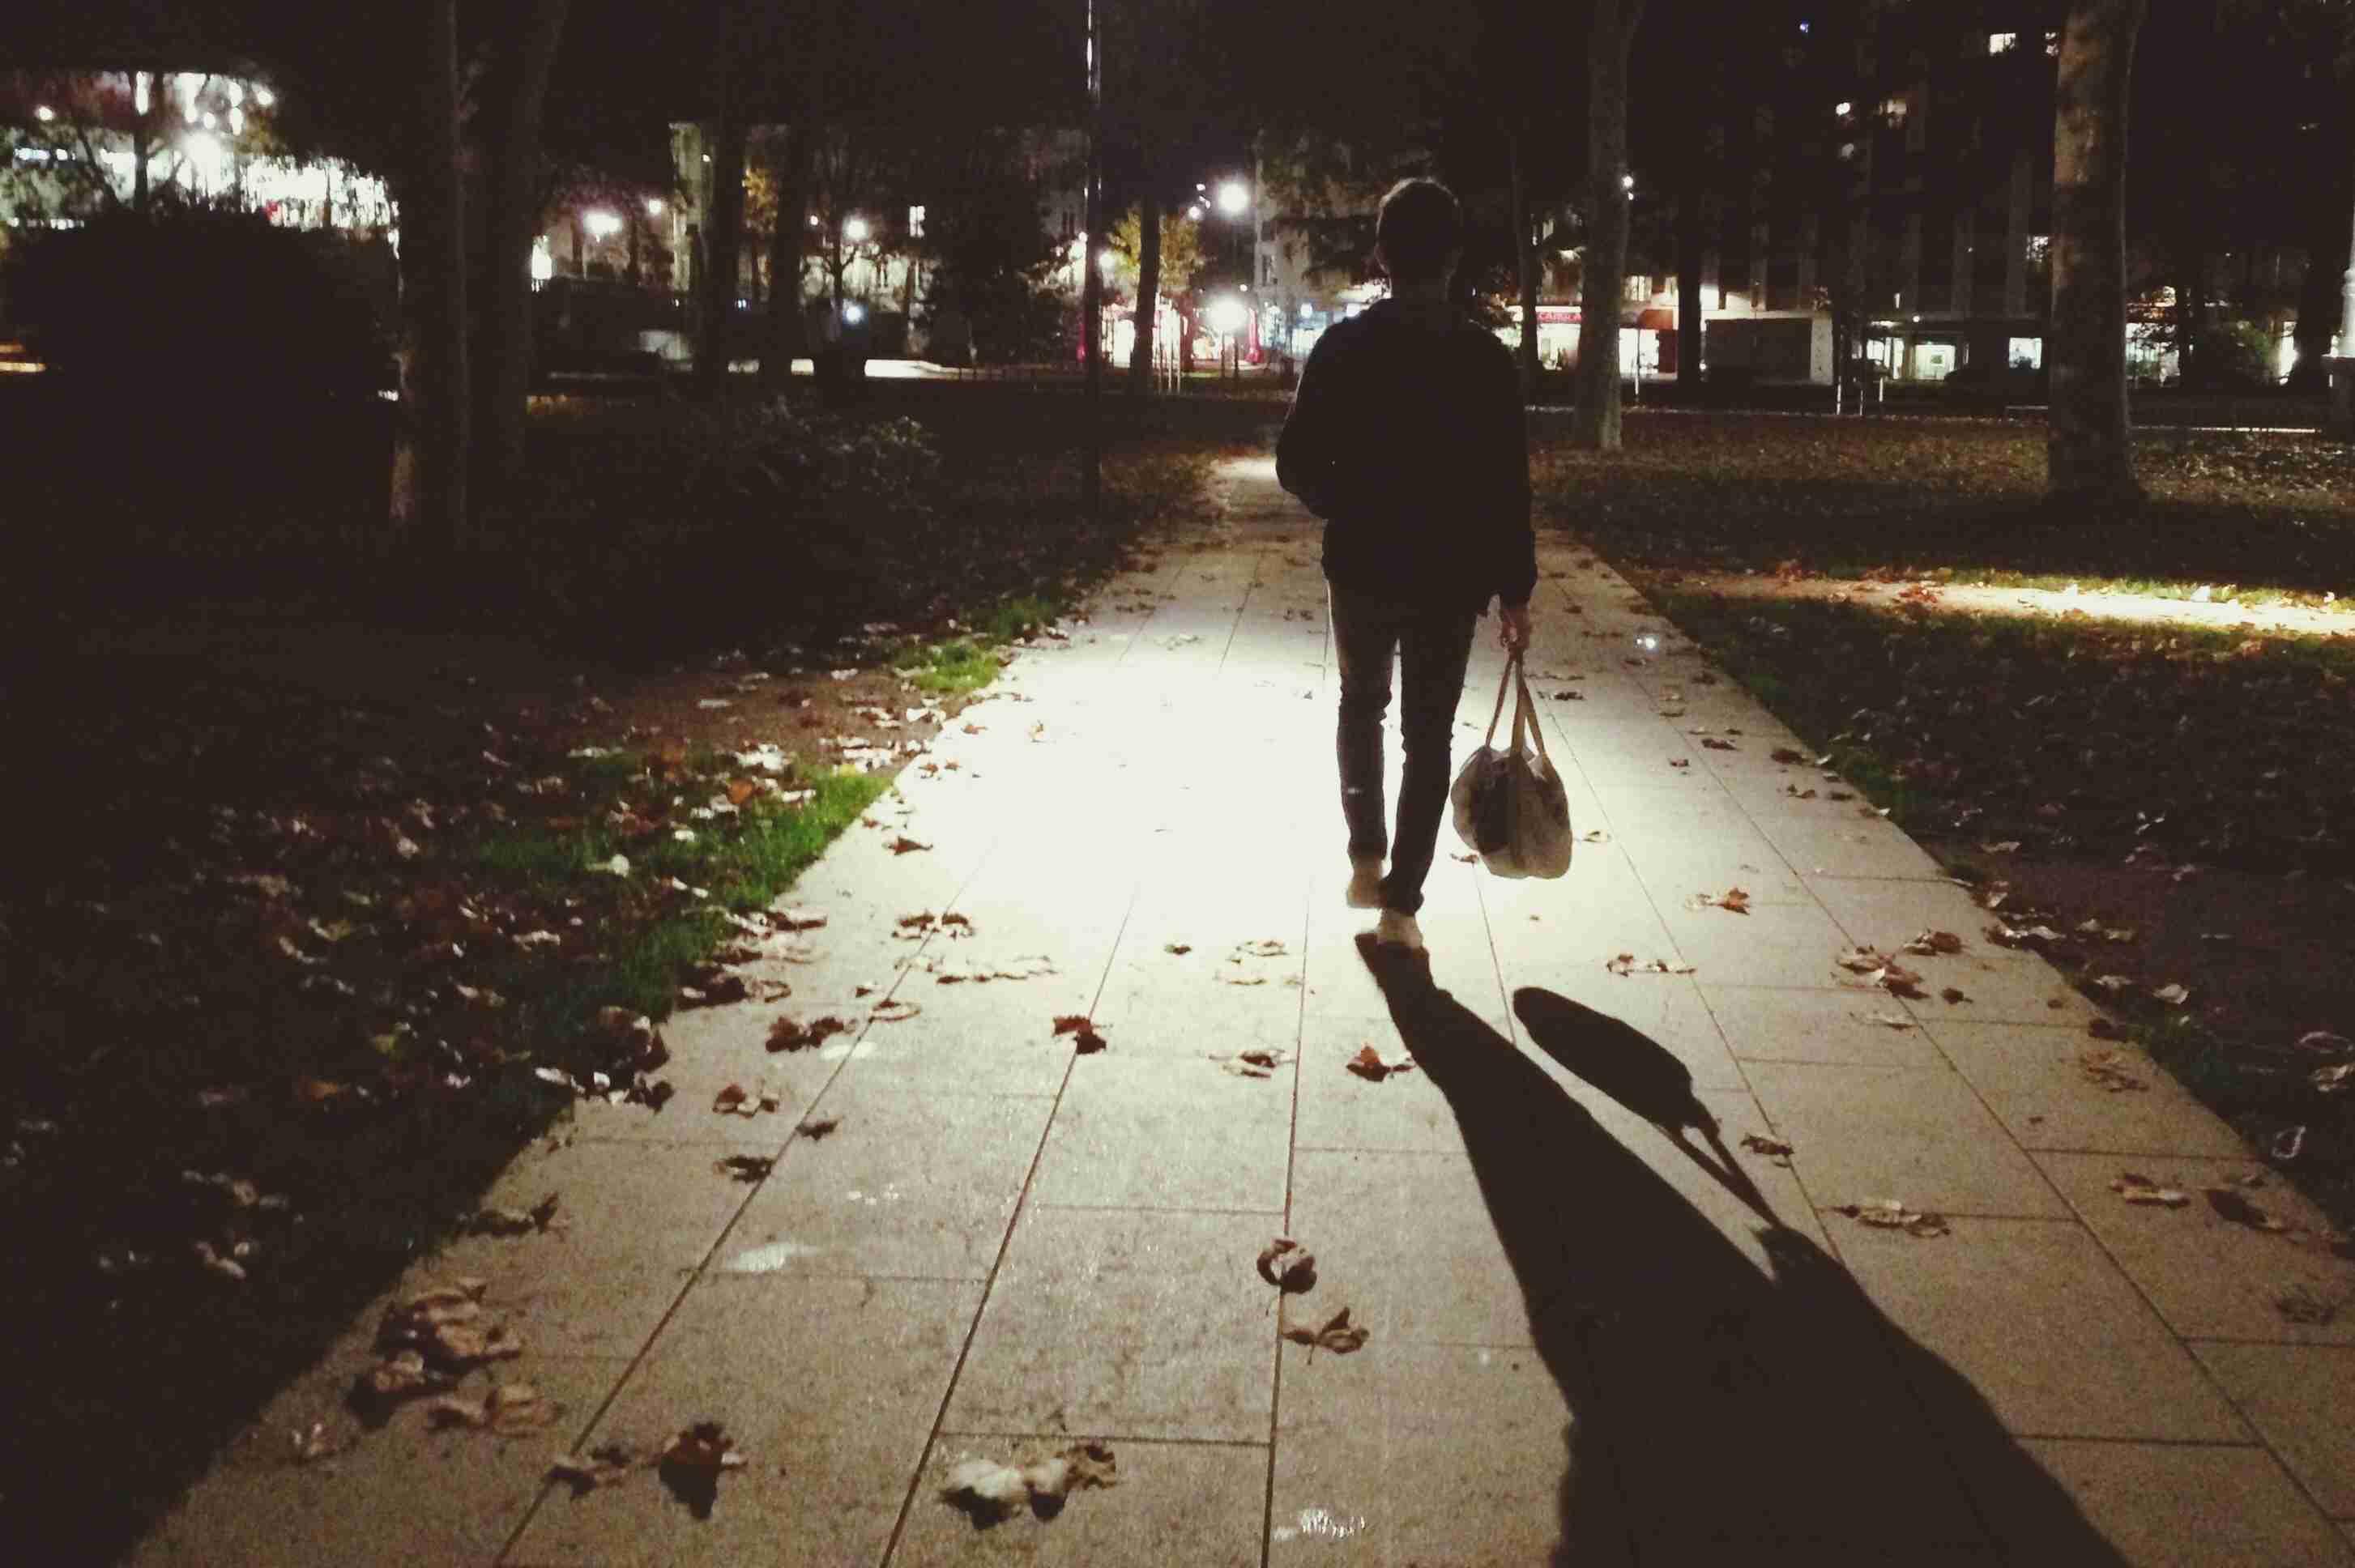 Woman walking on a sidewalk at night